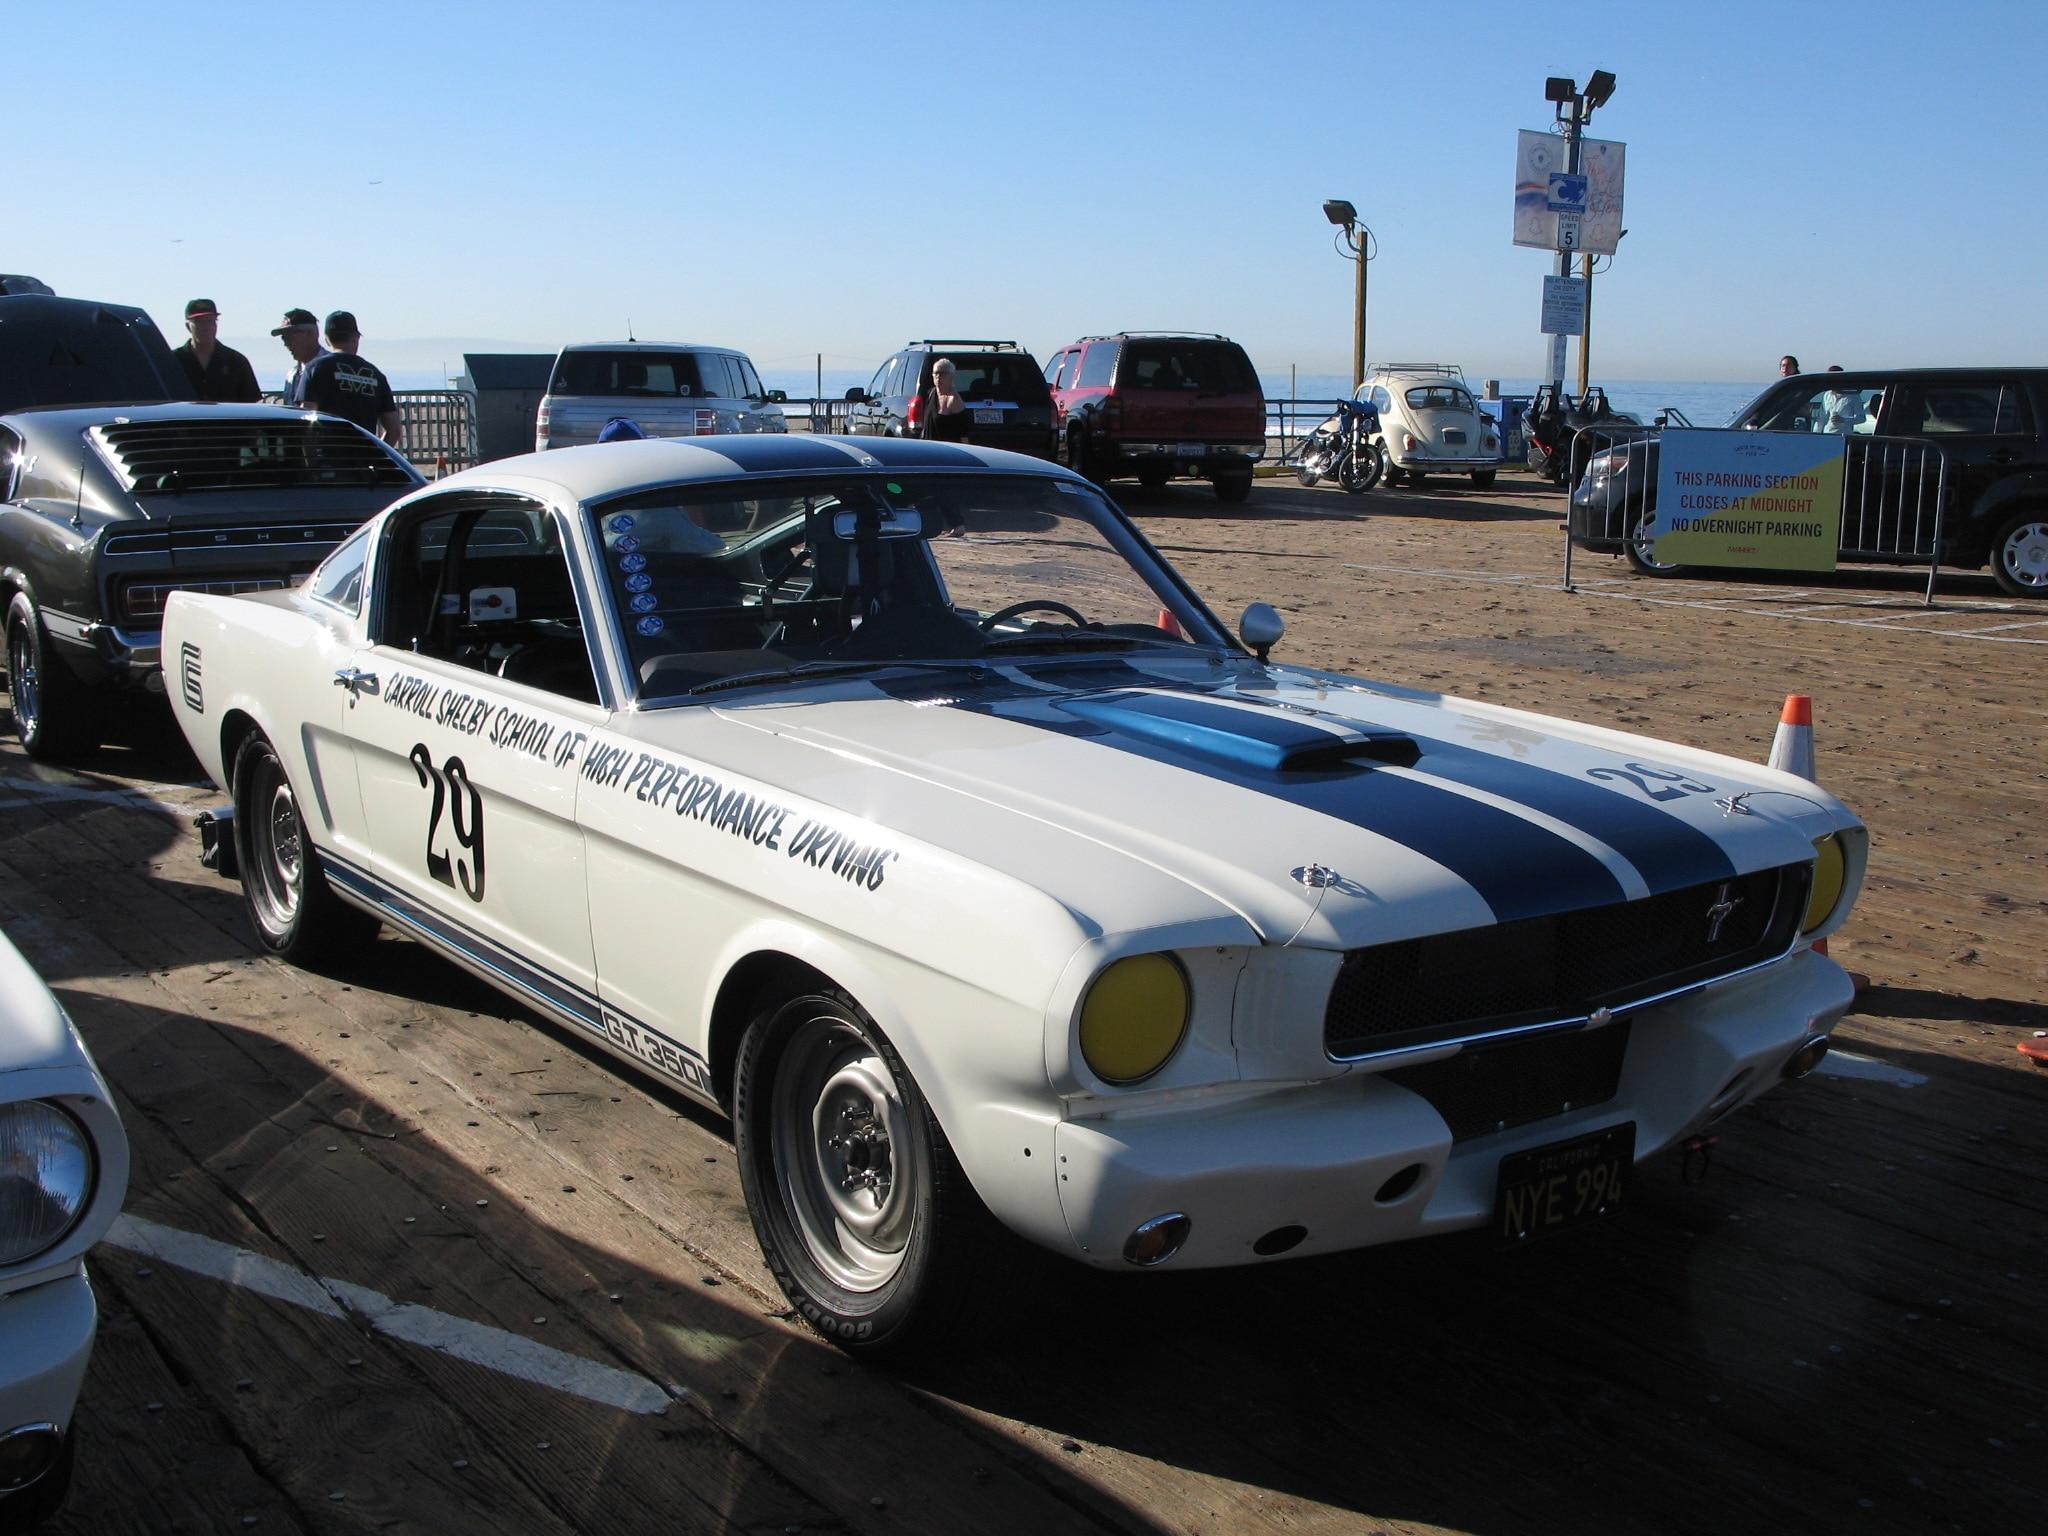 2016 Shelbys On Santa Monica Pier Lasaac 24